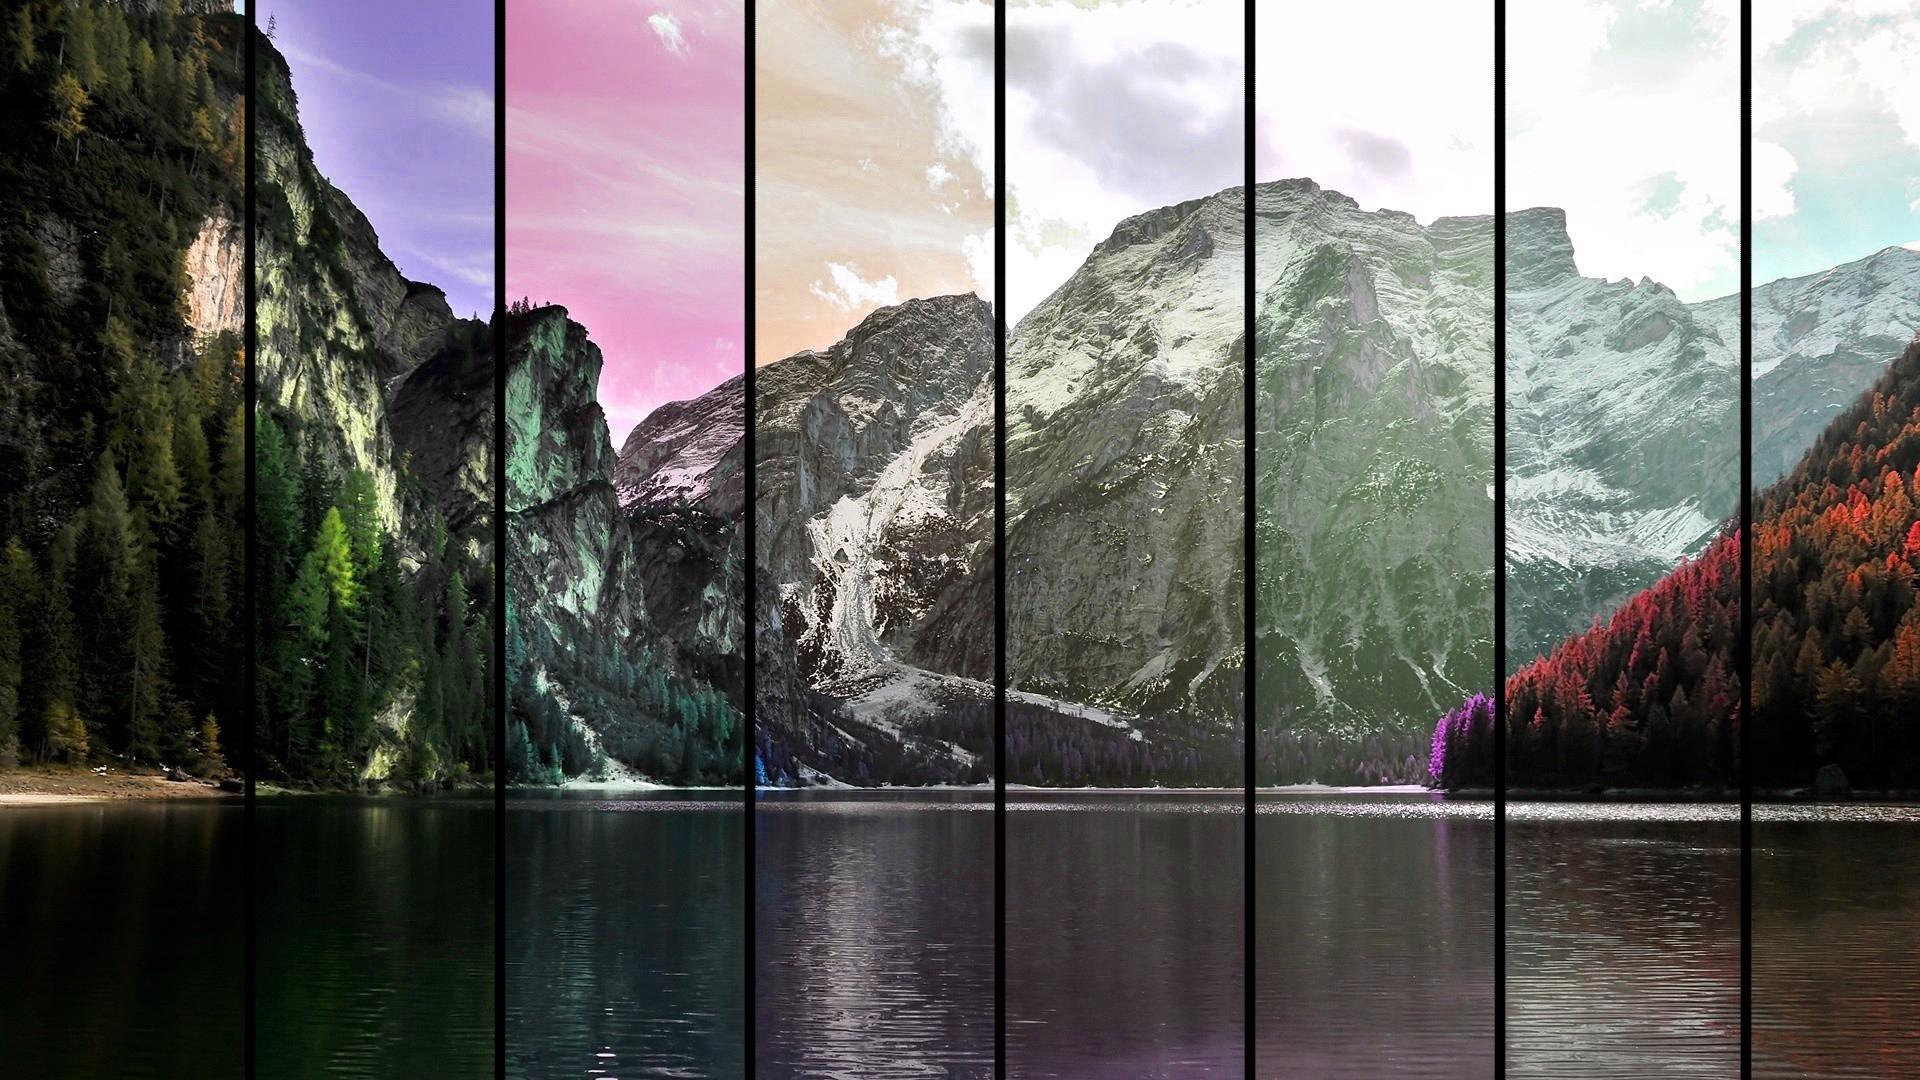 Mountains by MeGustaDeviantart